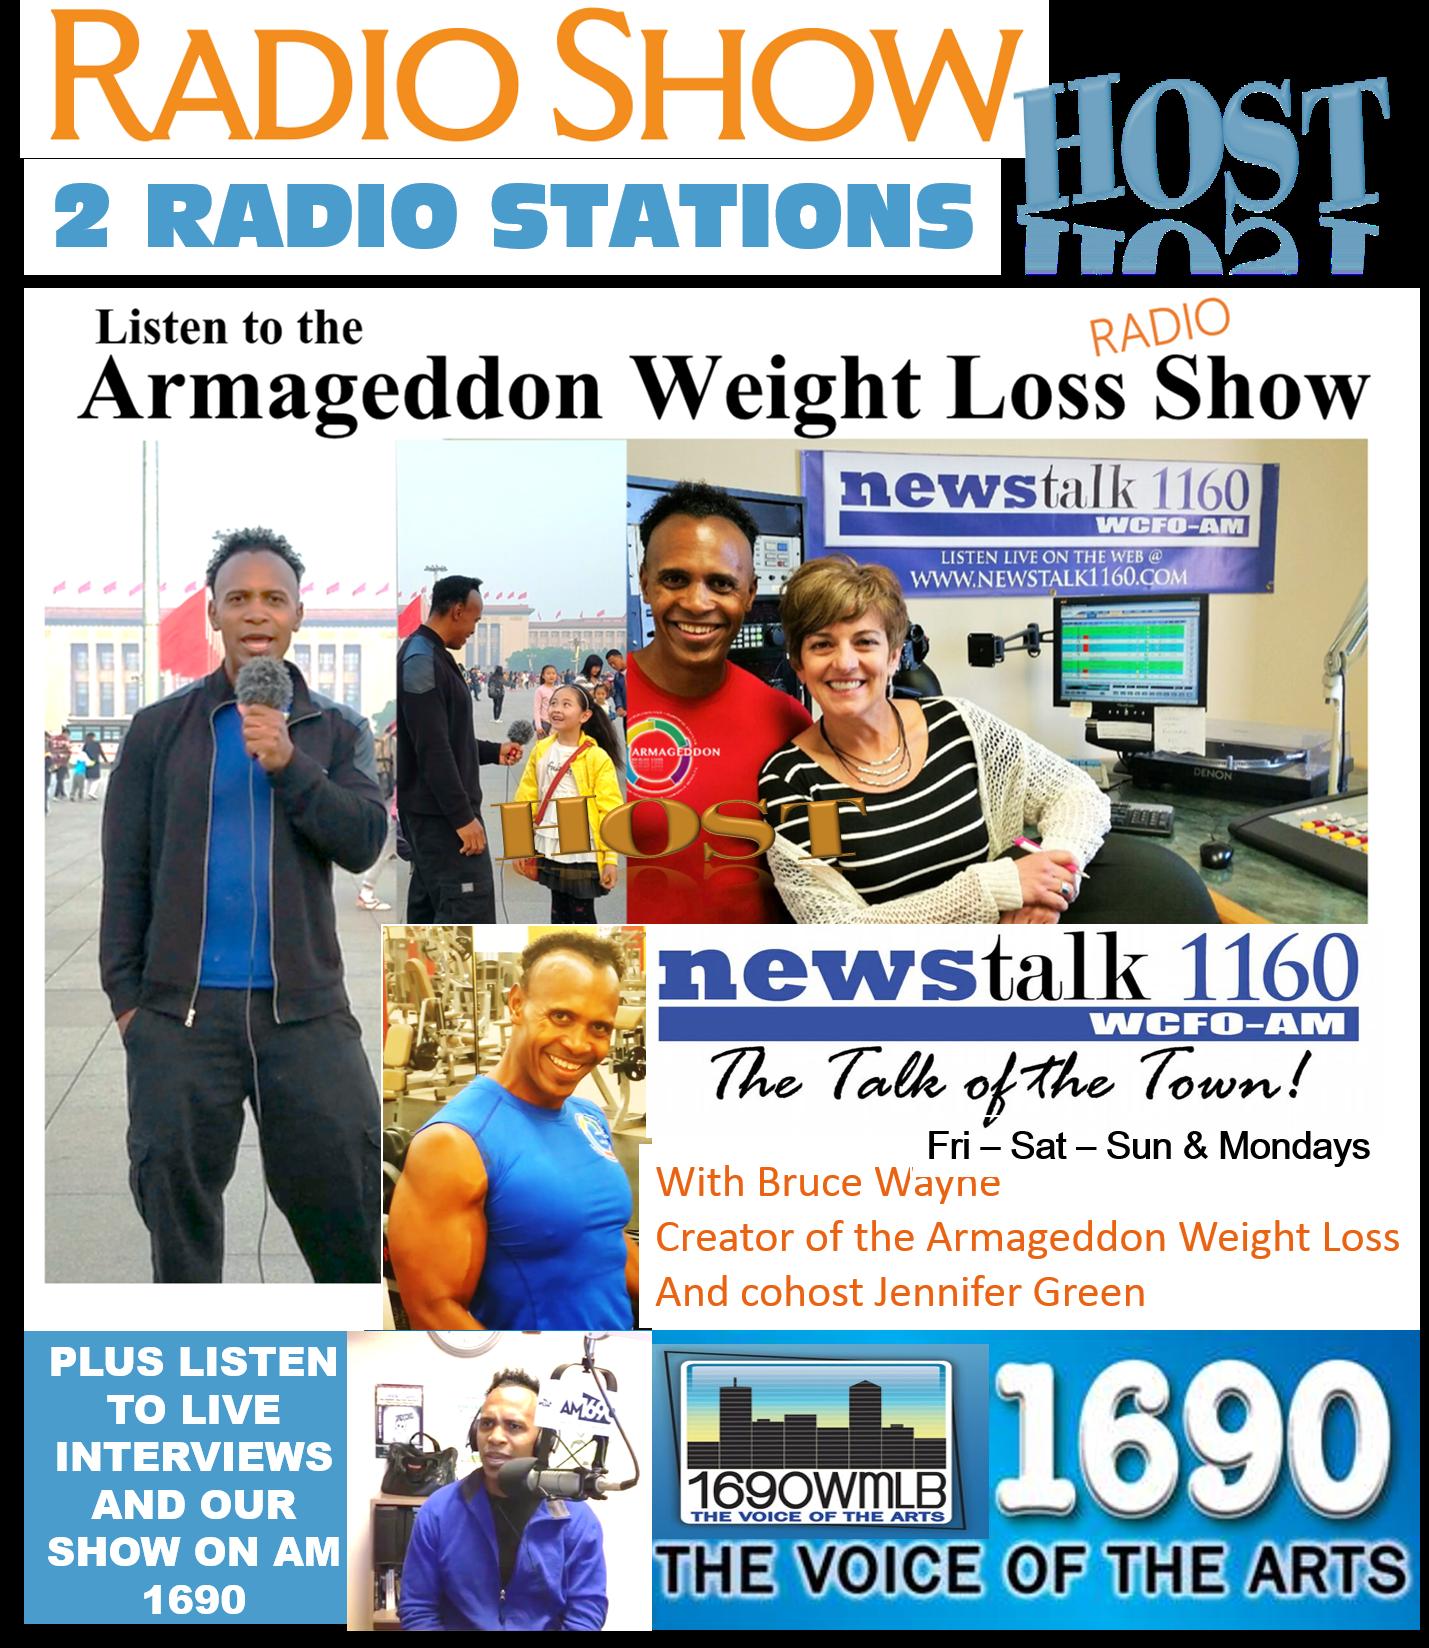 Armageddon Weight Loss Radio Show - ArmageddonWorld.com, Best weight loss program for women and men, Bruce Wayne - 40